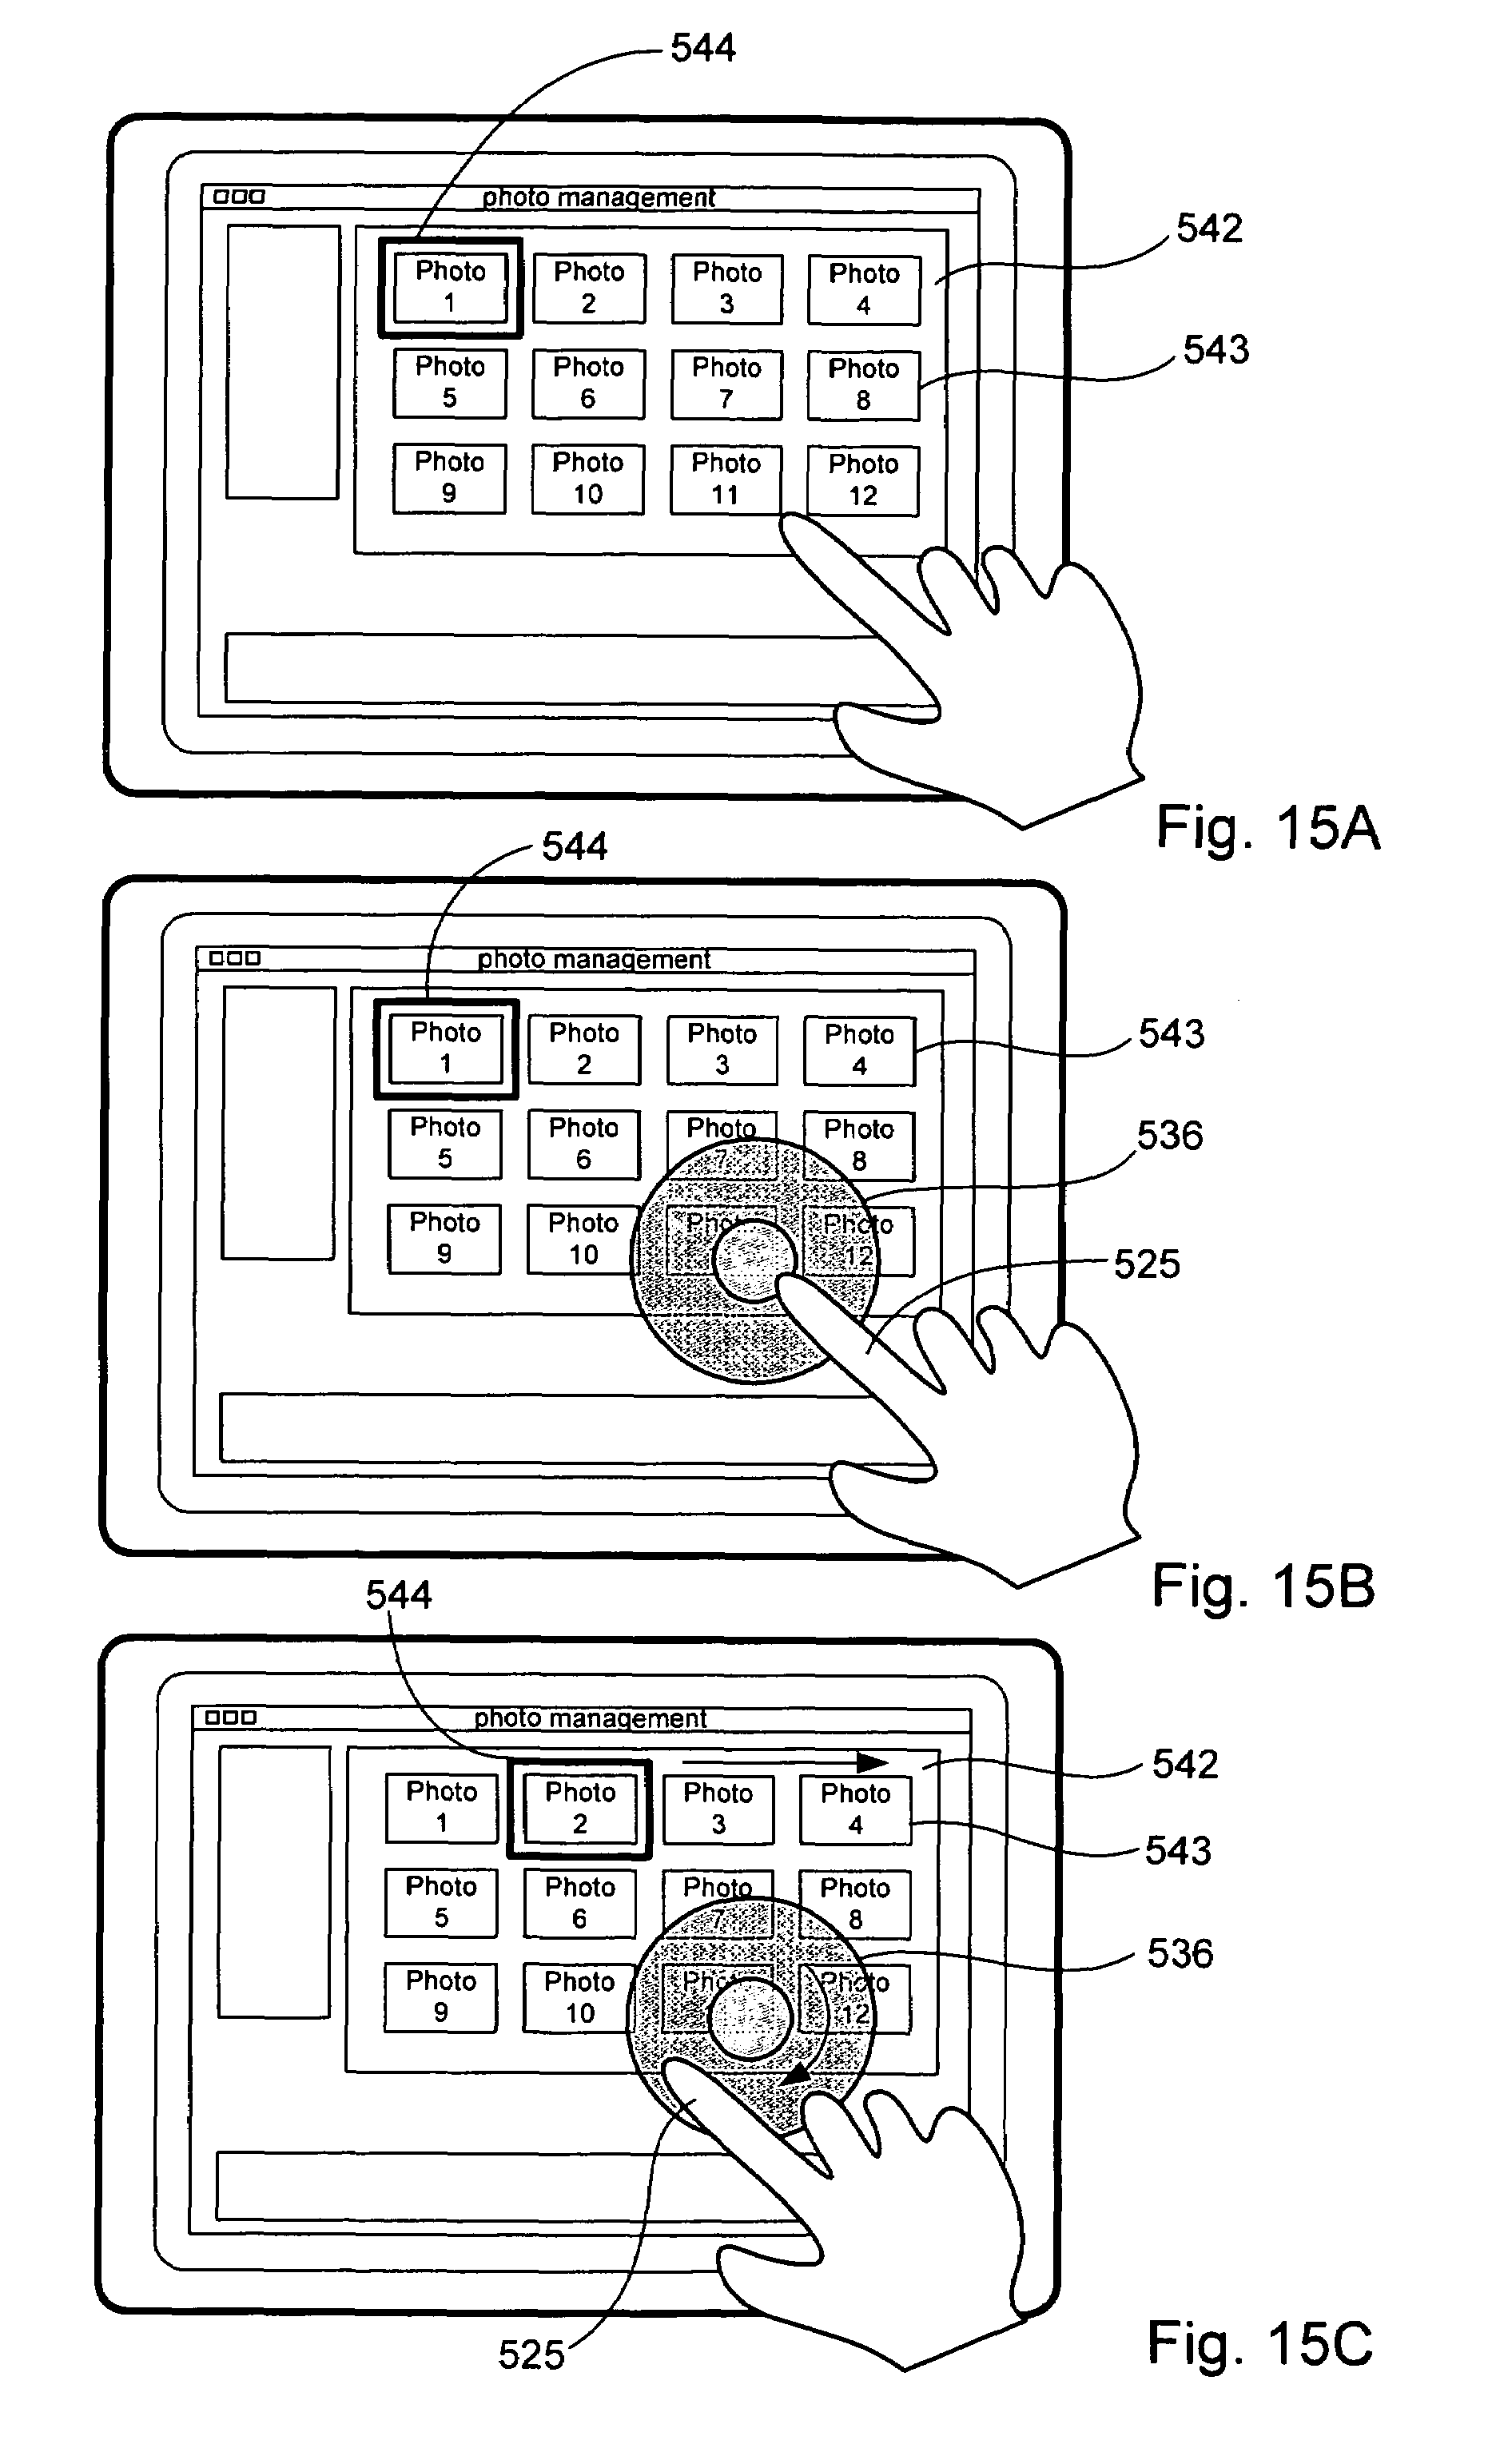 Patent US 7,653,883 B2